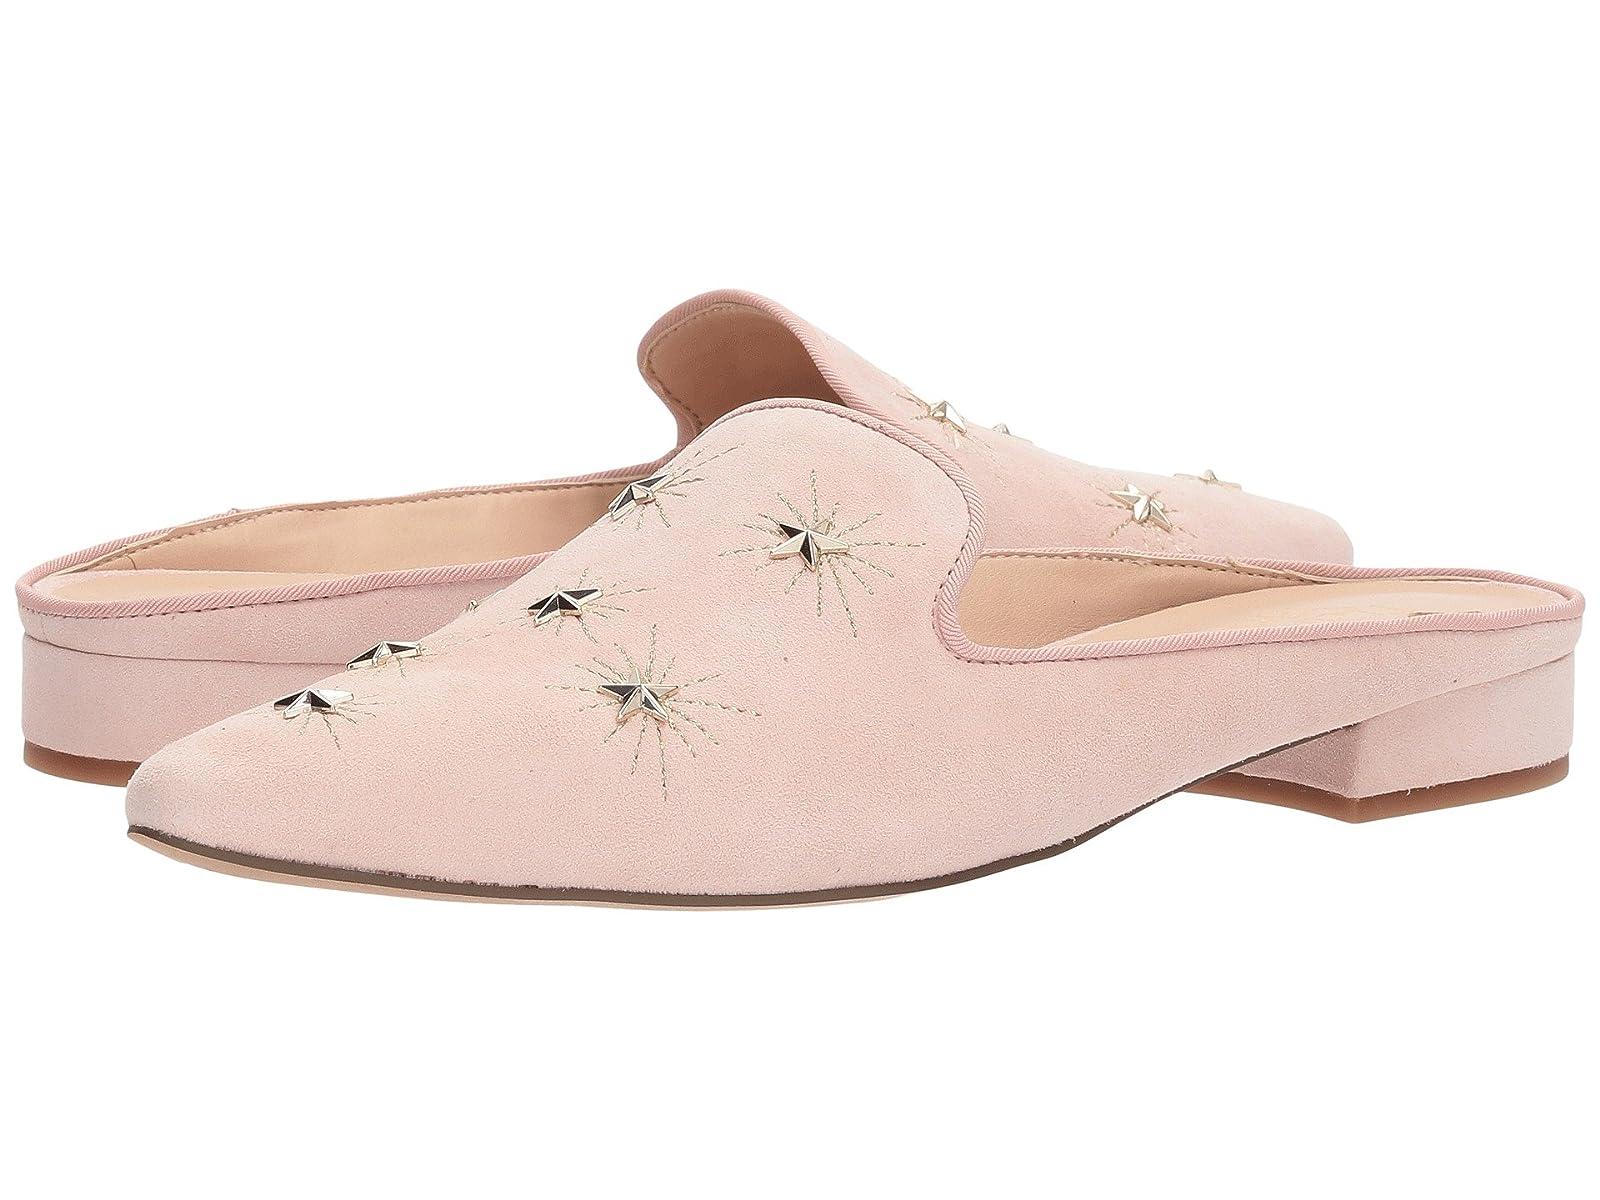 Franco Sarto SamantaCheap and distinctive eye-catching shoes